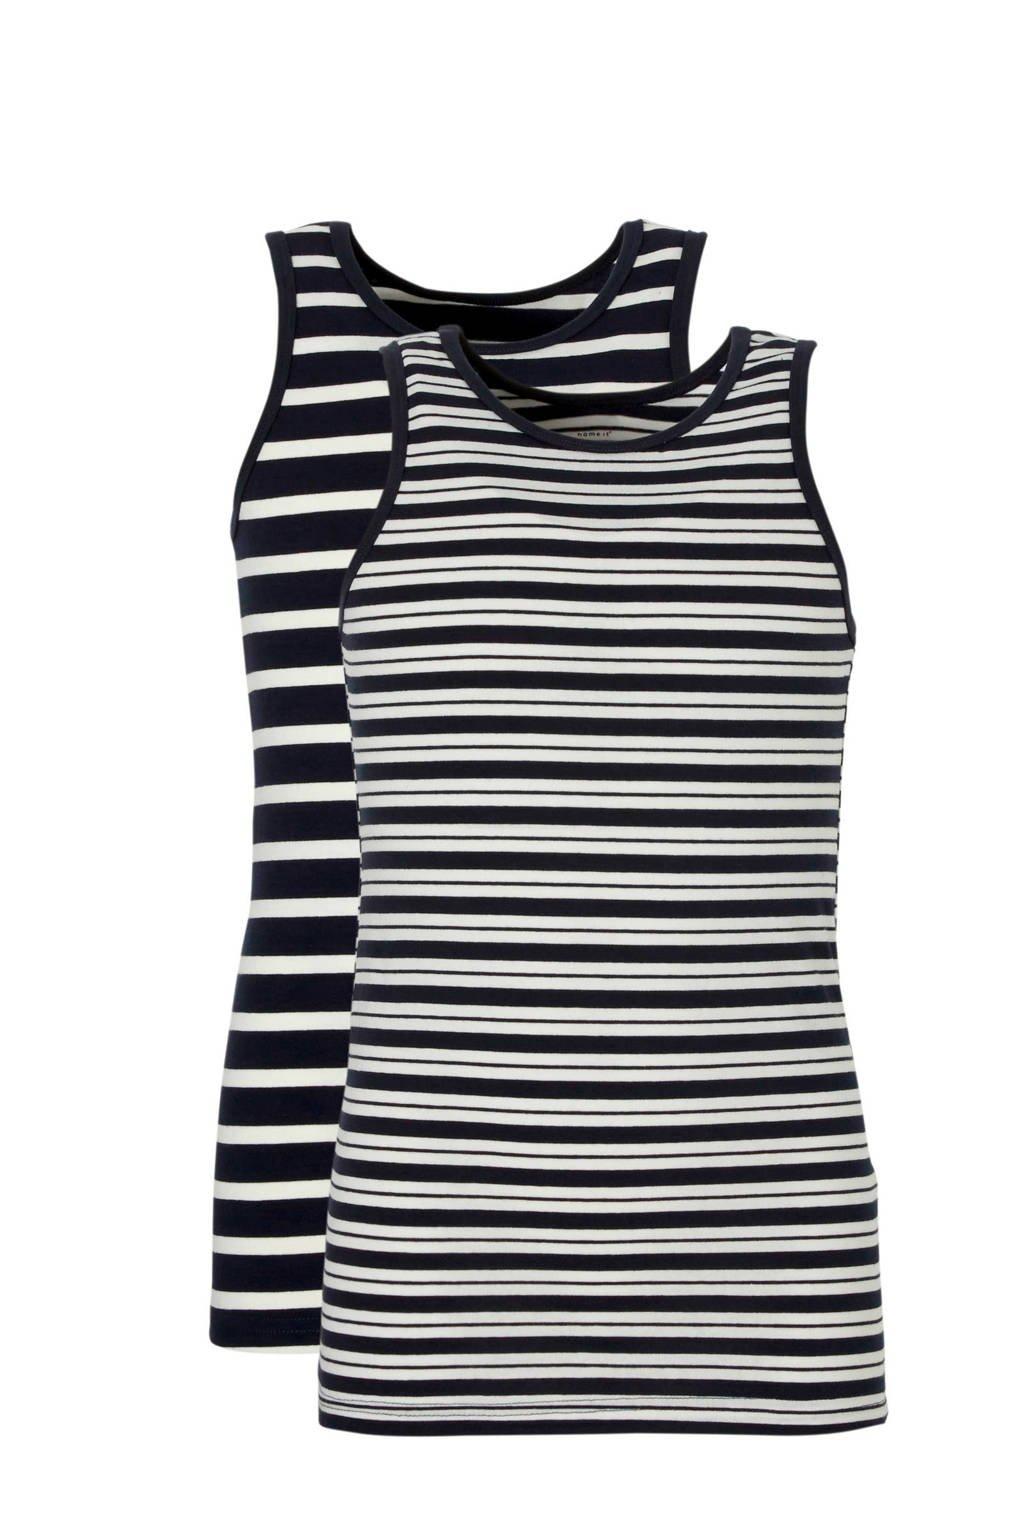 name it MINI hemd ( set van 2 ) met strepen, Donkerblauw/ off White